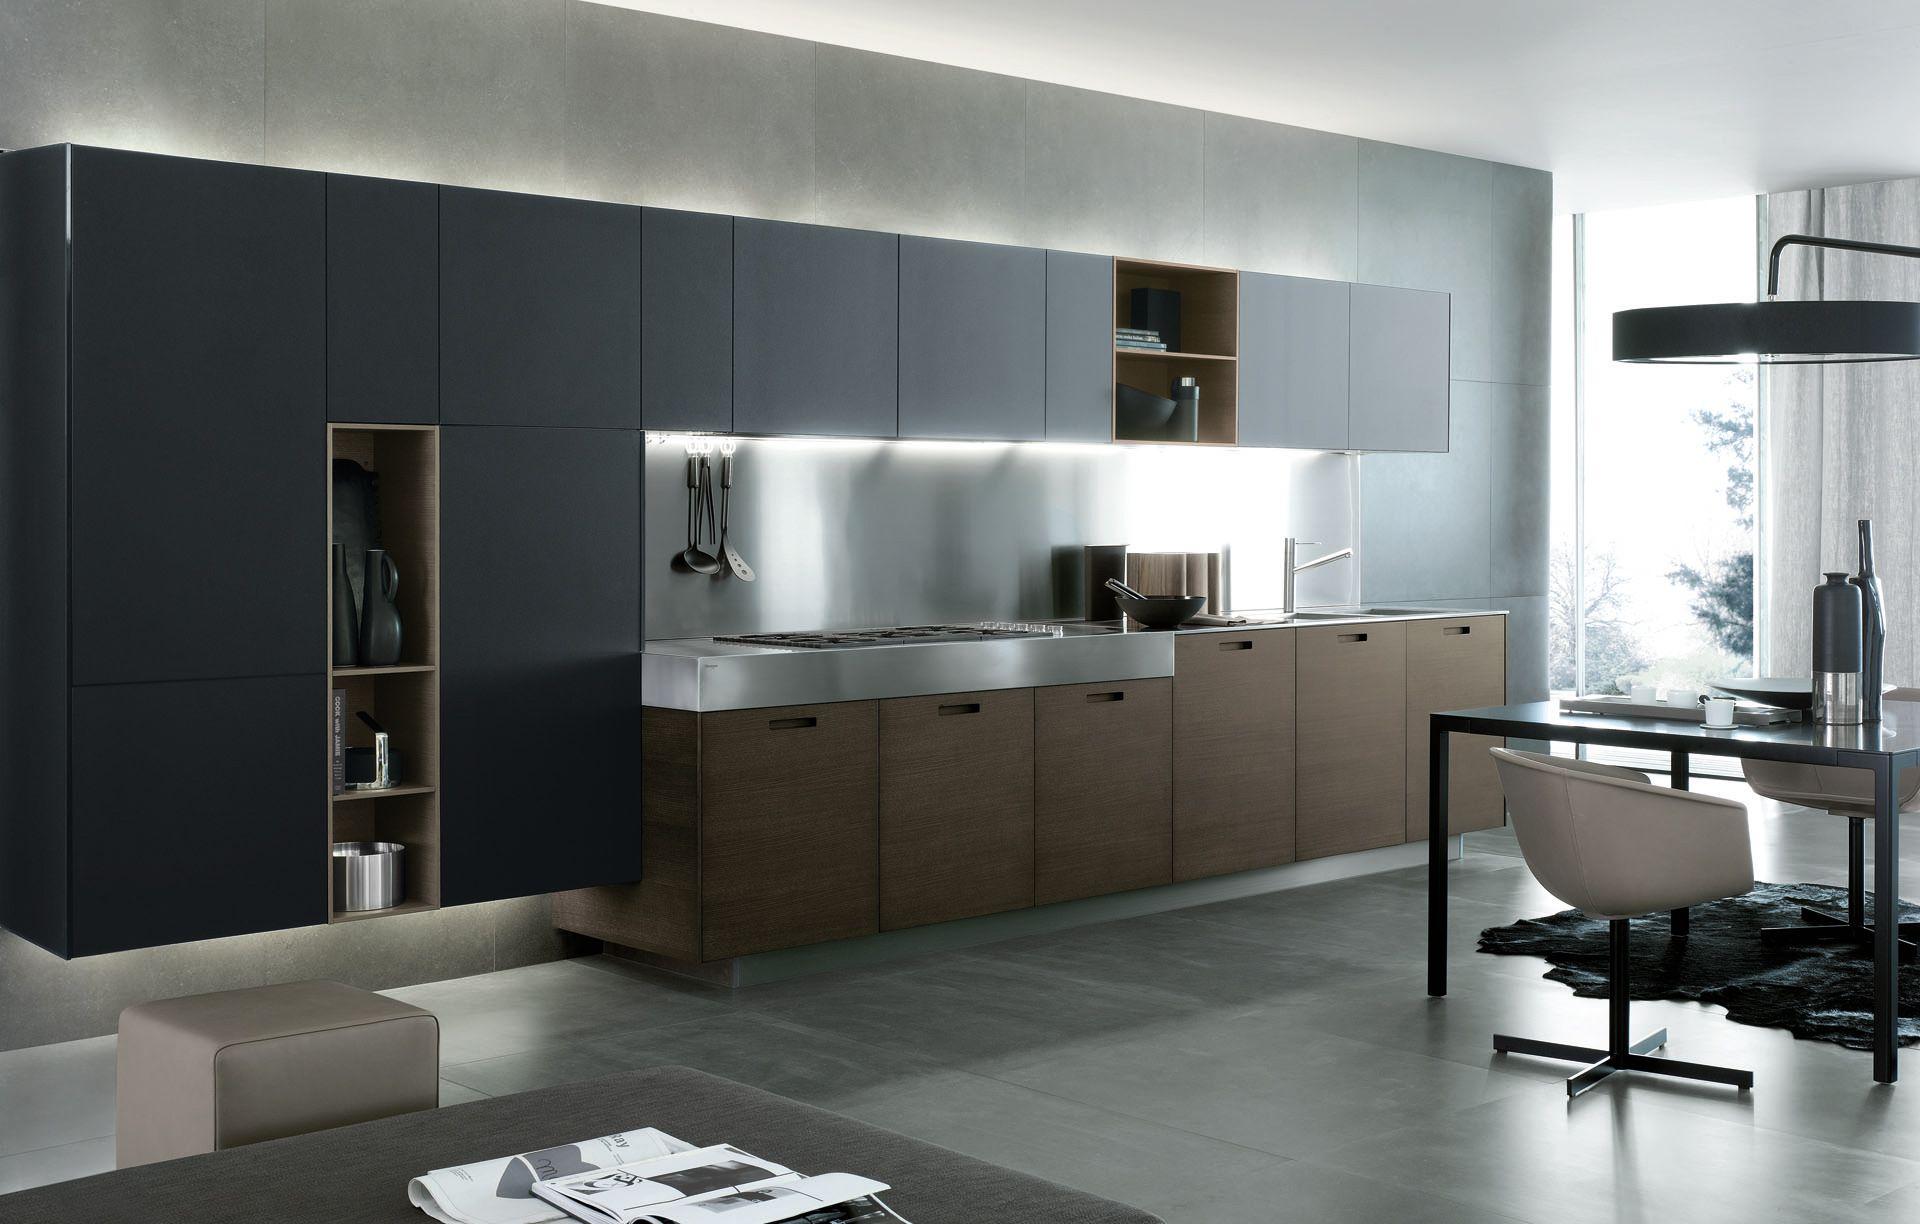 Kyton Kitchen Cabinetry Designedpoliform Kitchen Cabinetry Custom Poliform Kitchen Design